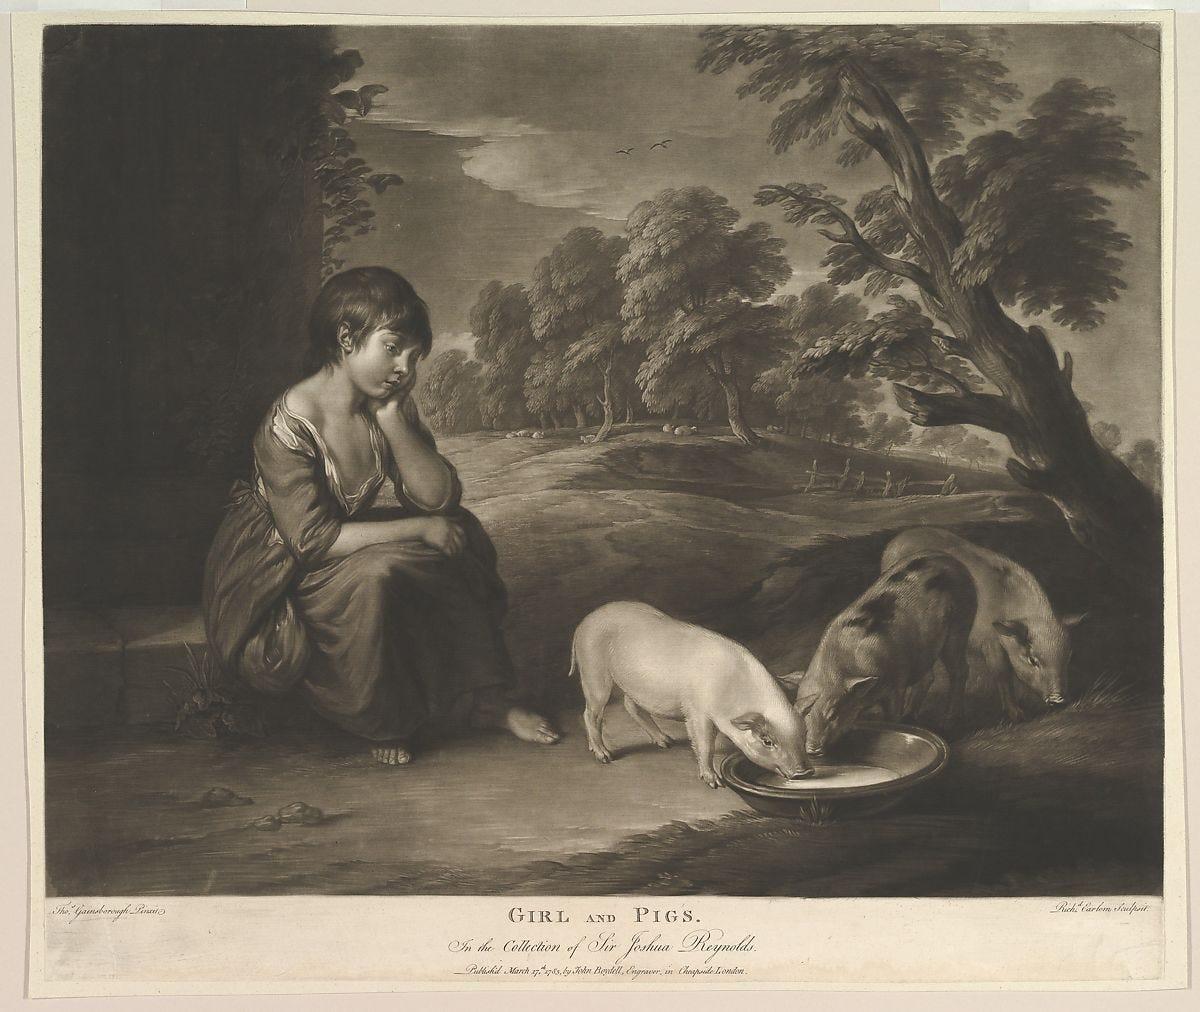 Girl and Pigs, Richard Earlom (British, London 1743–1822 London), Mezzotint